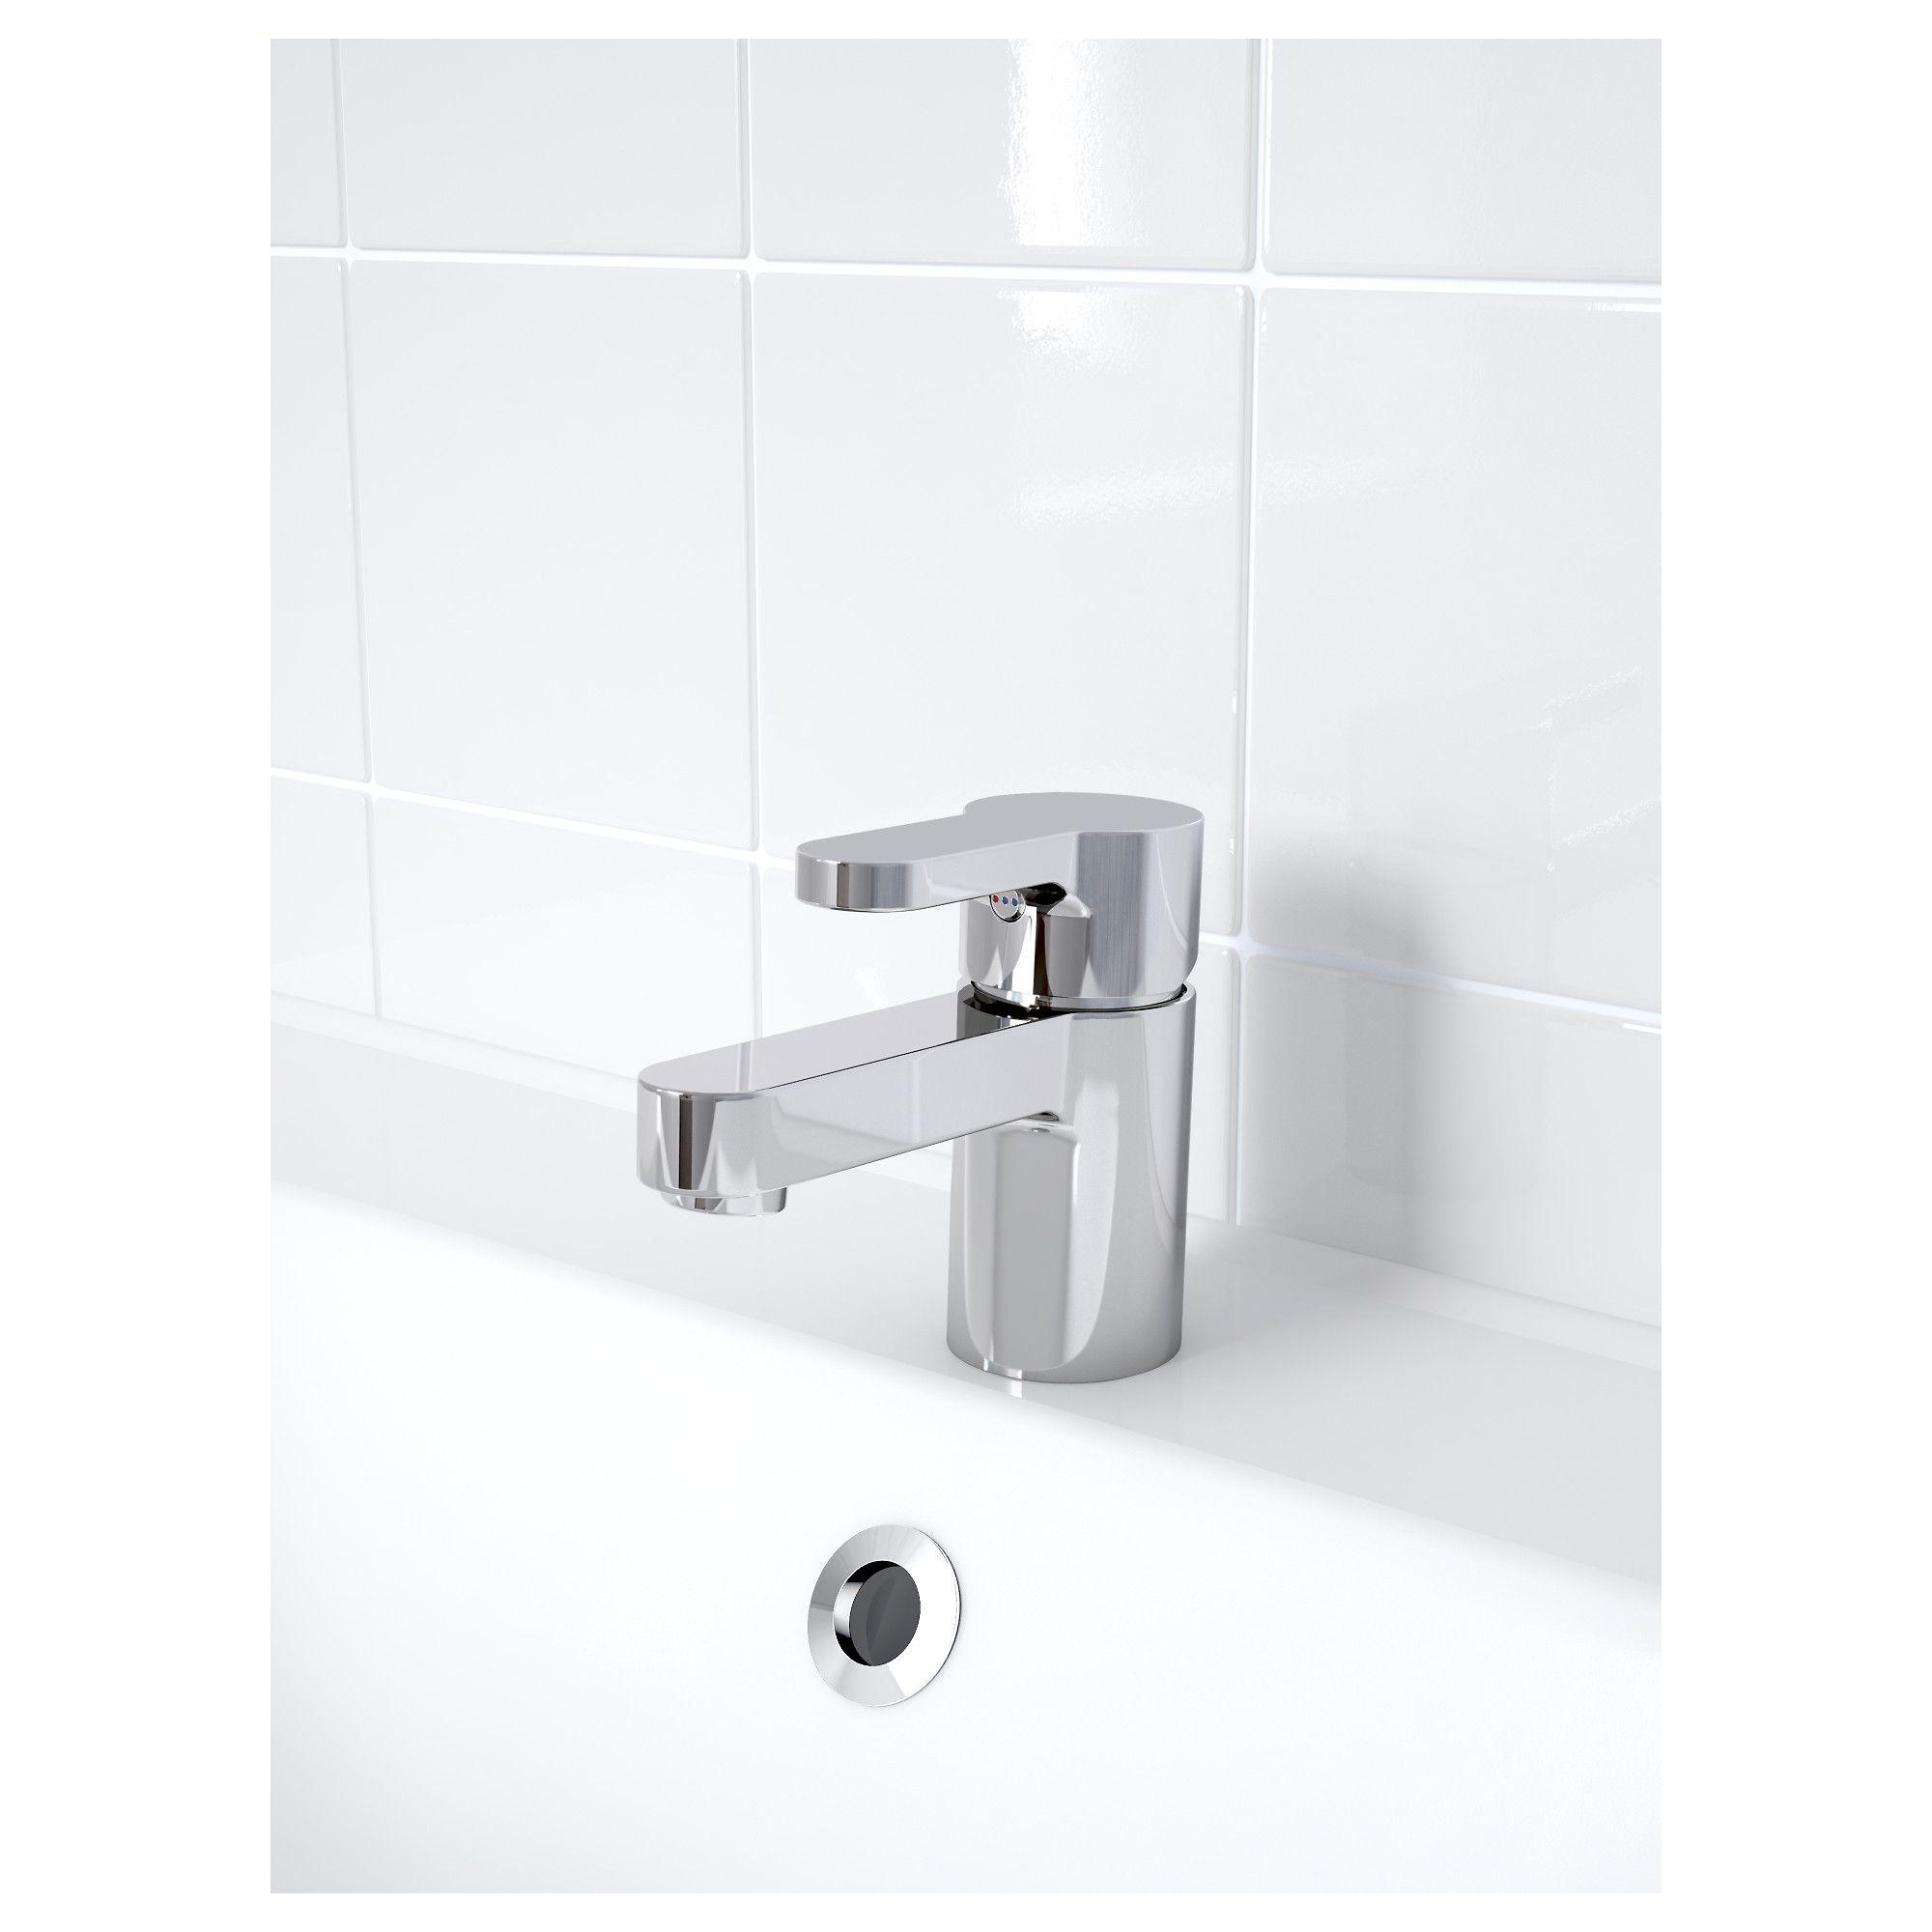 IKEA - ENSEN Bathroom faucet chrome plated | Bathroom | Pinterest ...